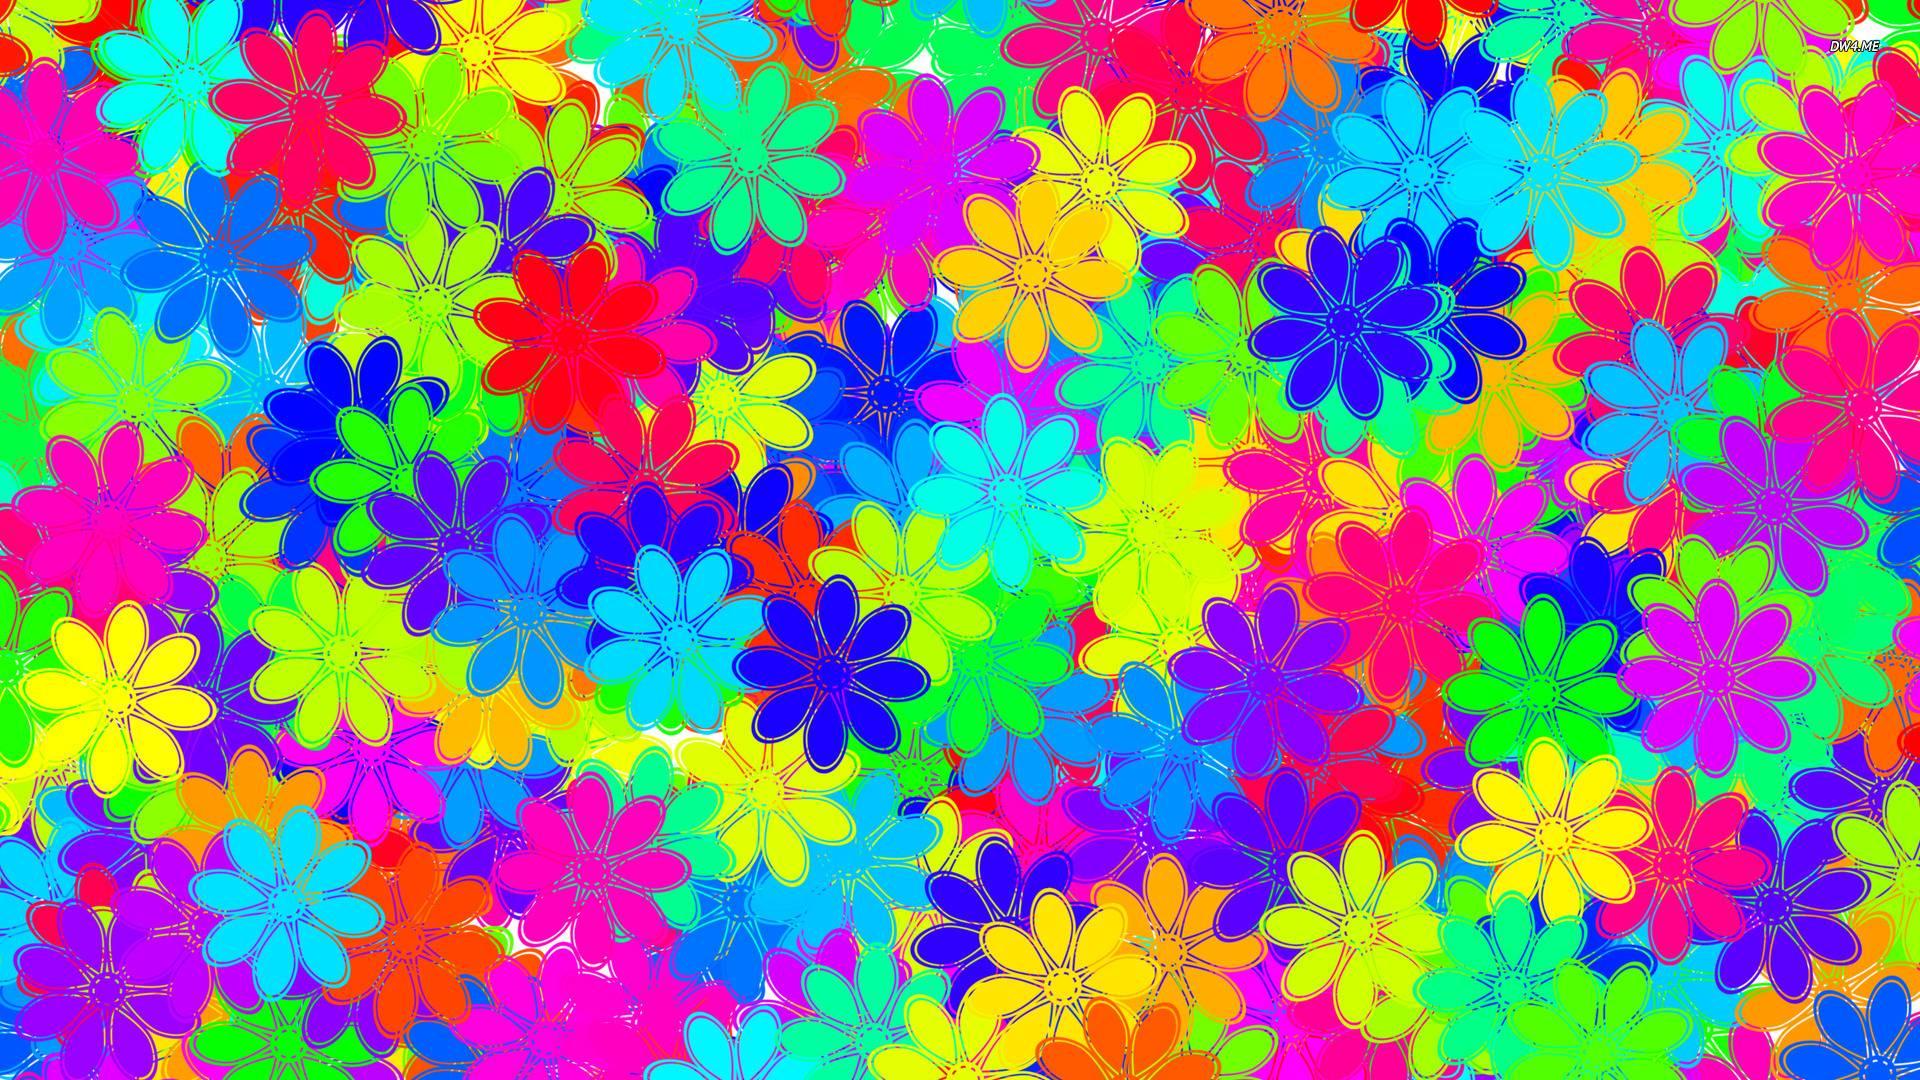 Cute spring flower - Spring Flowers Wallpaper 1920x1080 Px 18571 Spring Flowers